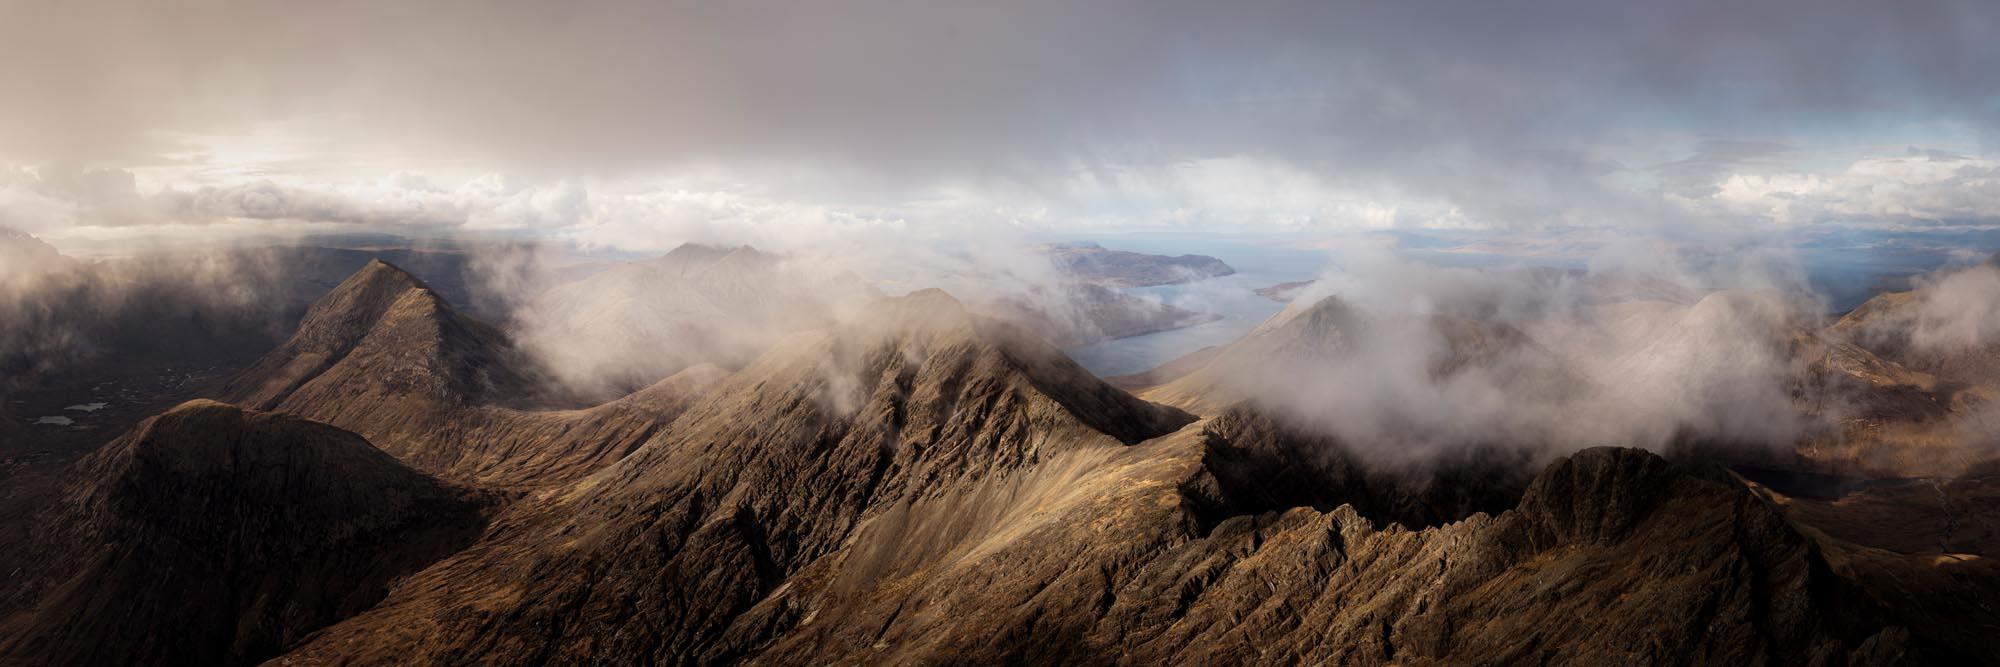 Panoramic print of the Scottish mountains Bla Bheinn on the isle of Skye